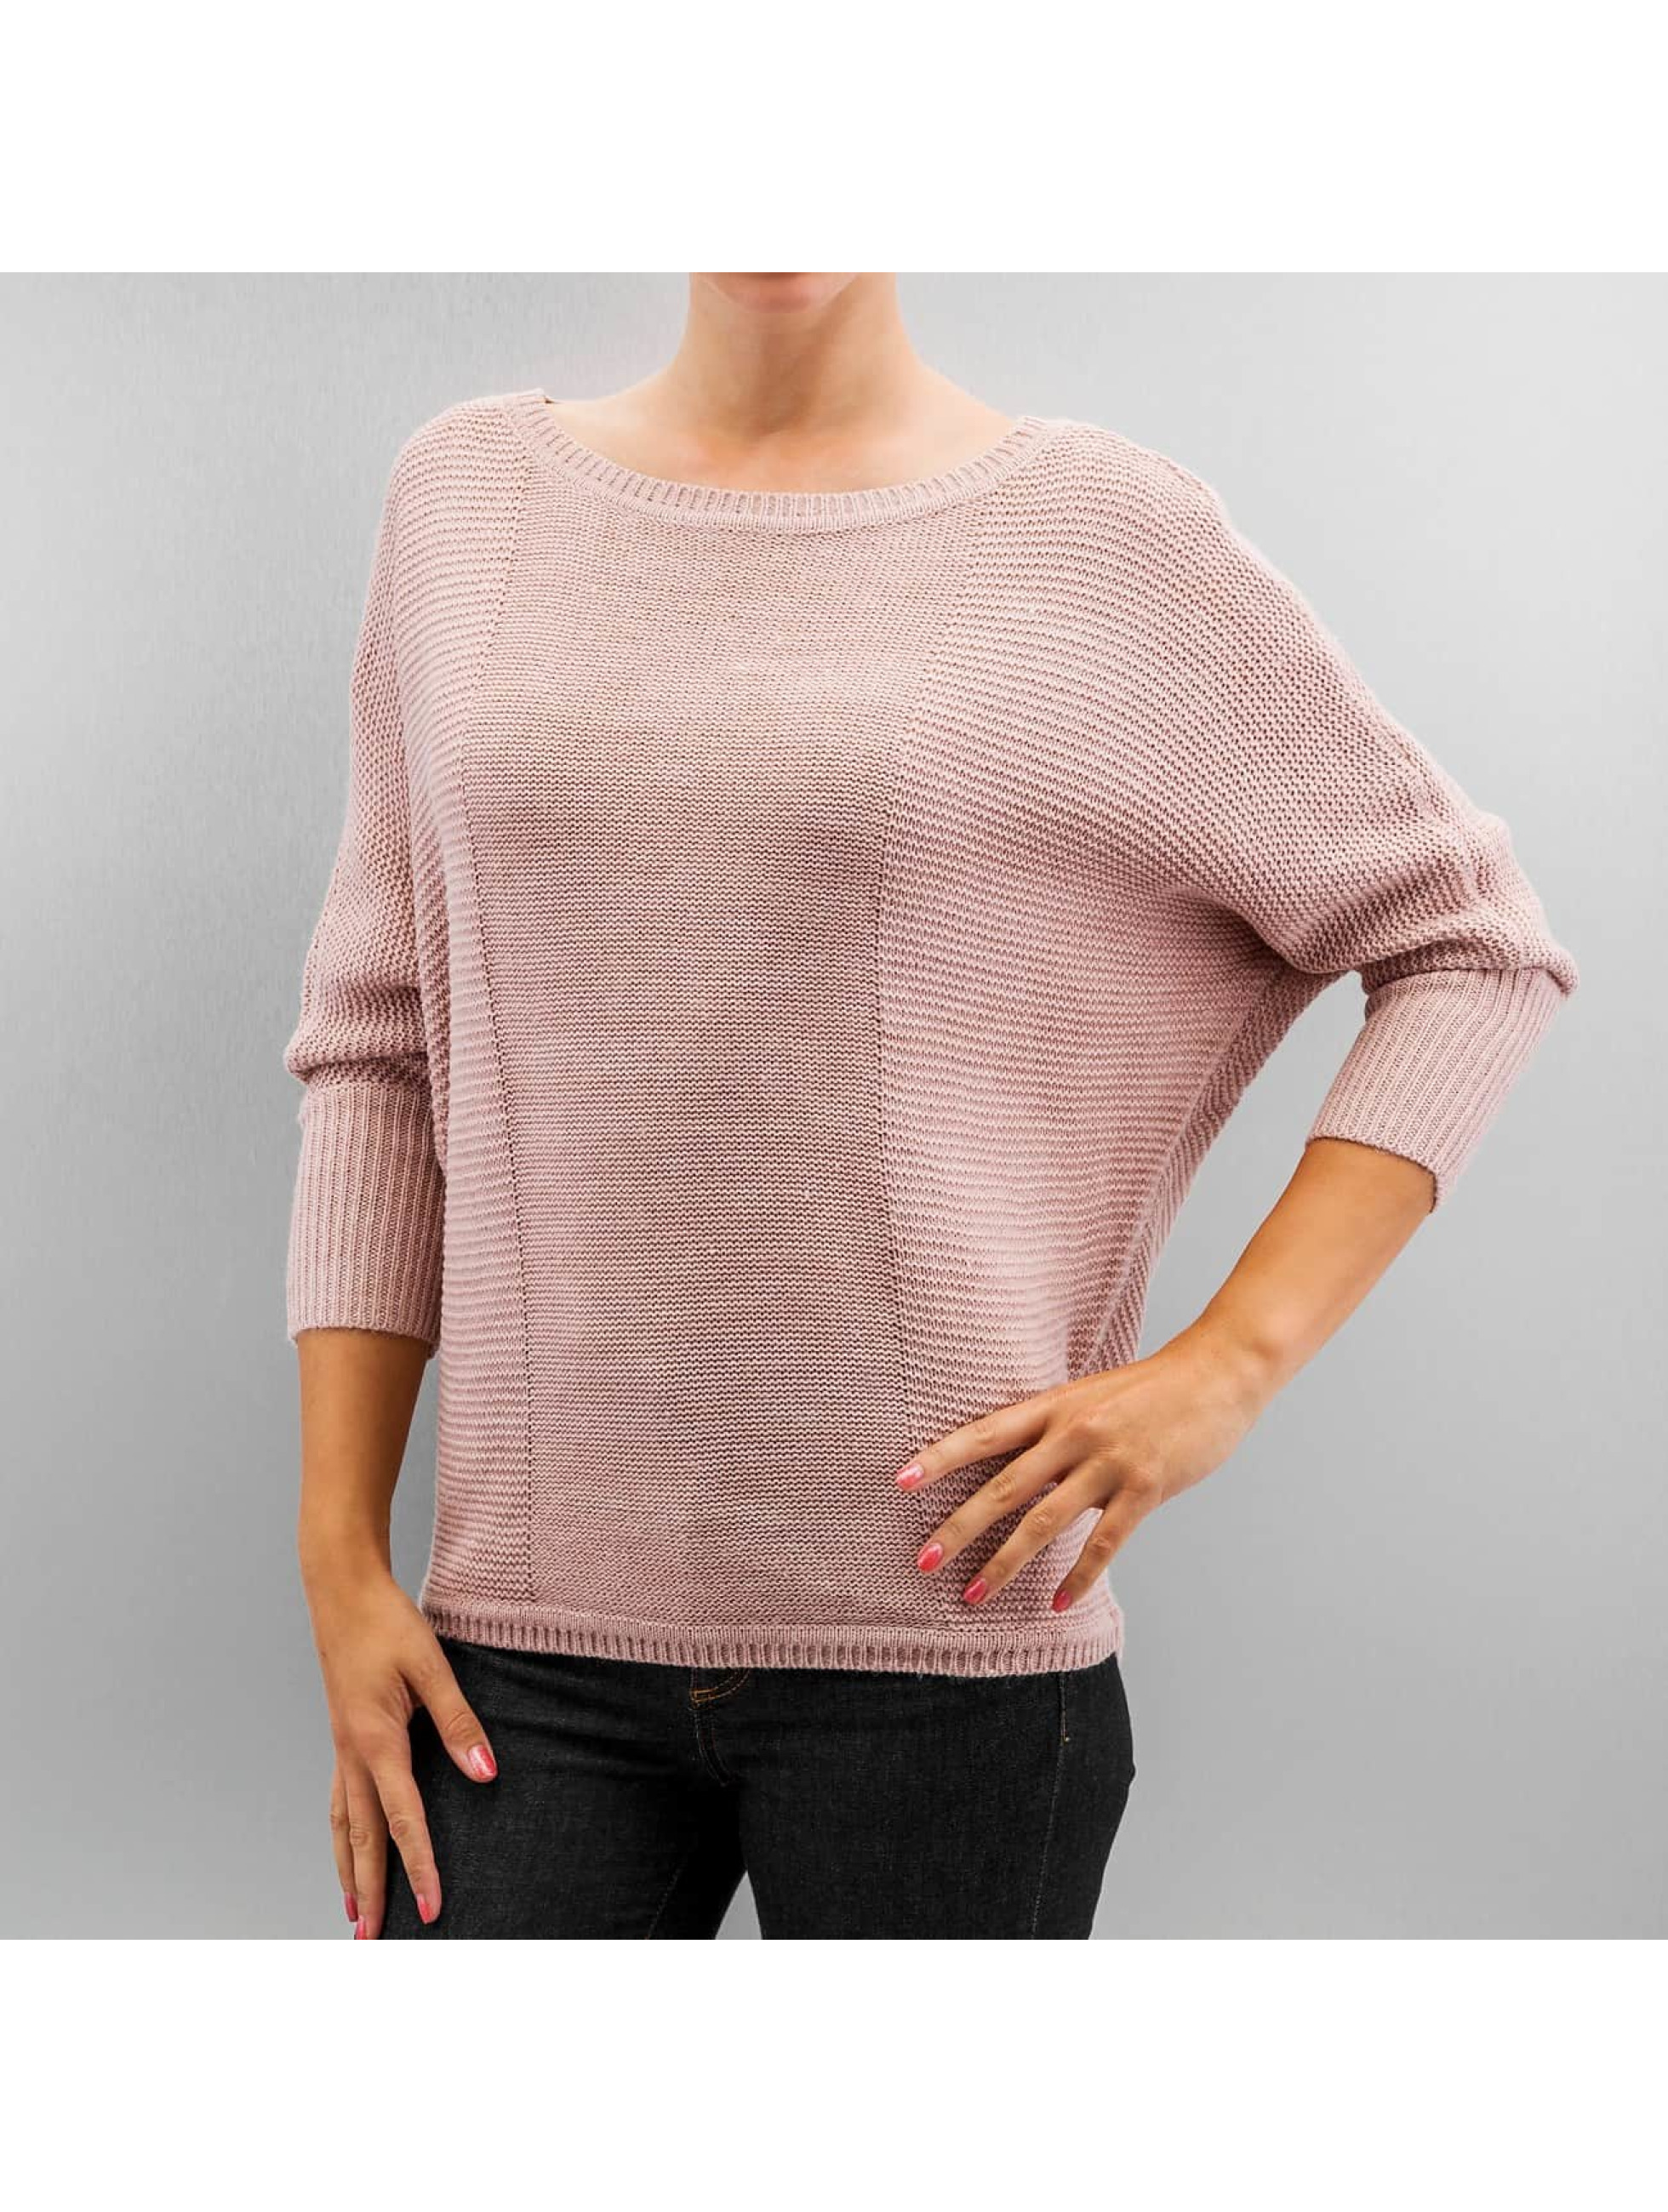 Pullover onlKiev in rosa